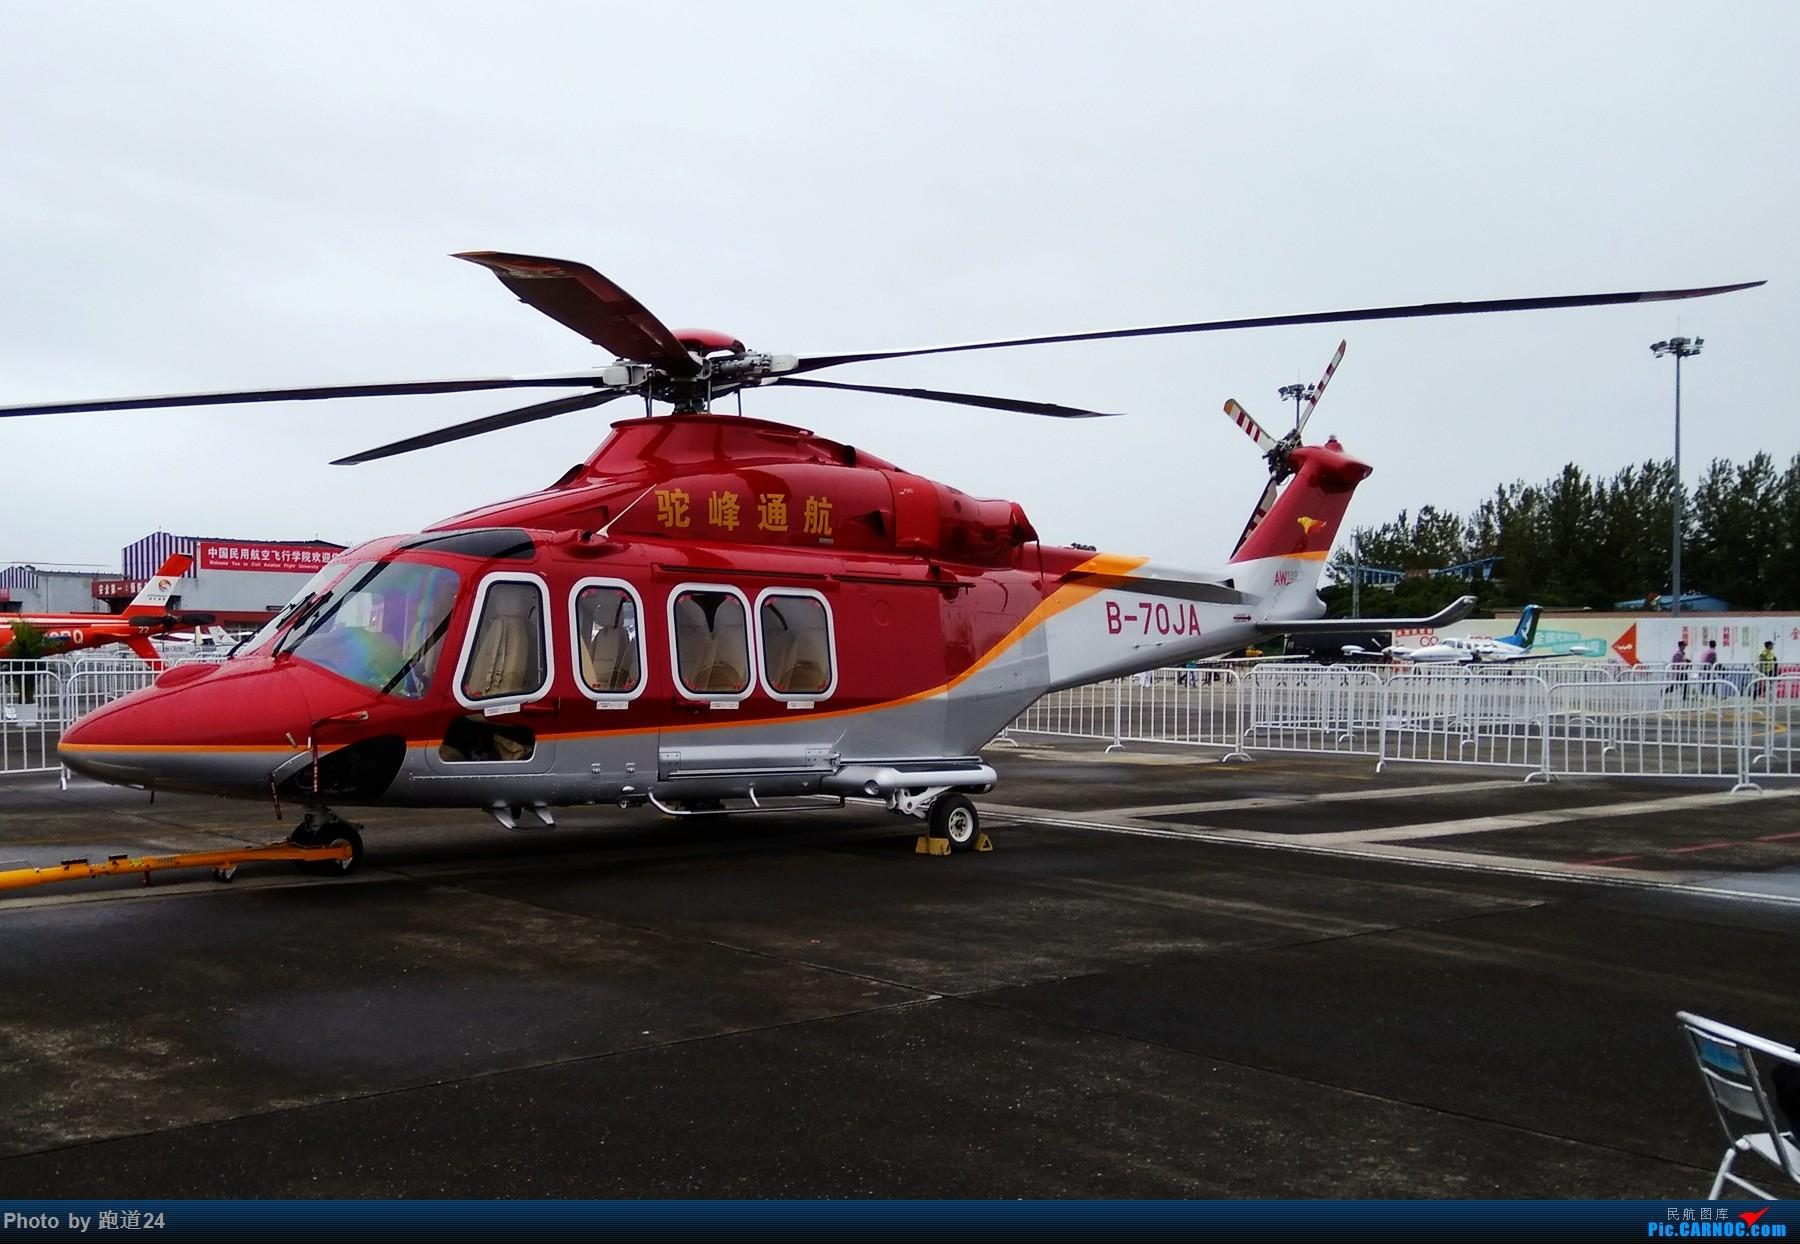 Re:[原创]【多图党】首次参观航展 AGUSTA AW139 B-70JA 中国广汉机场